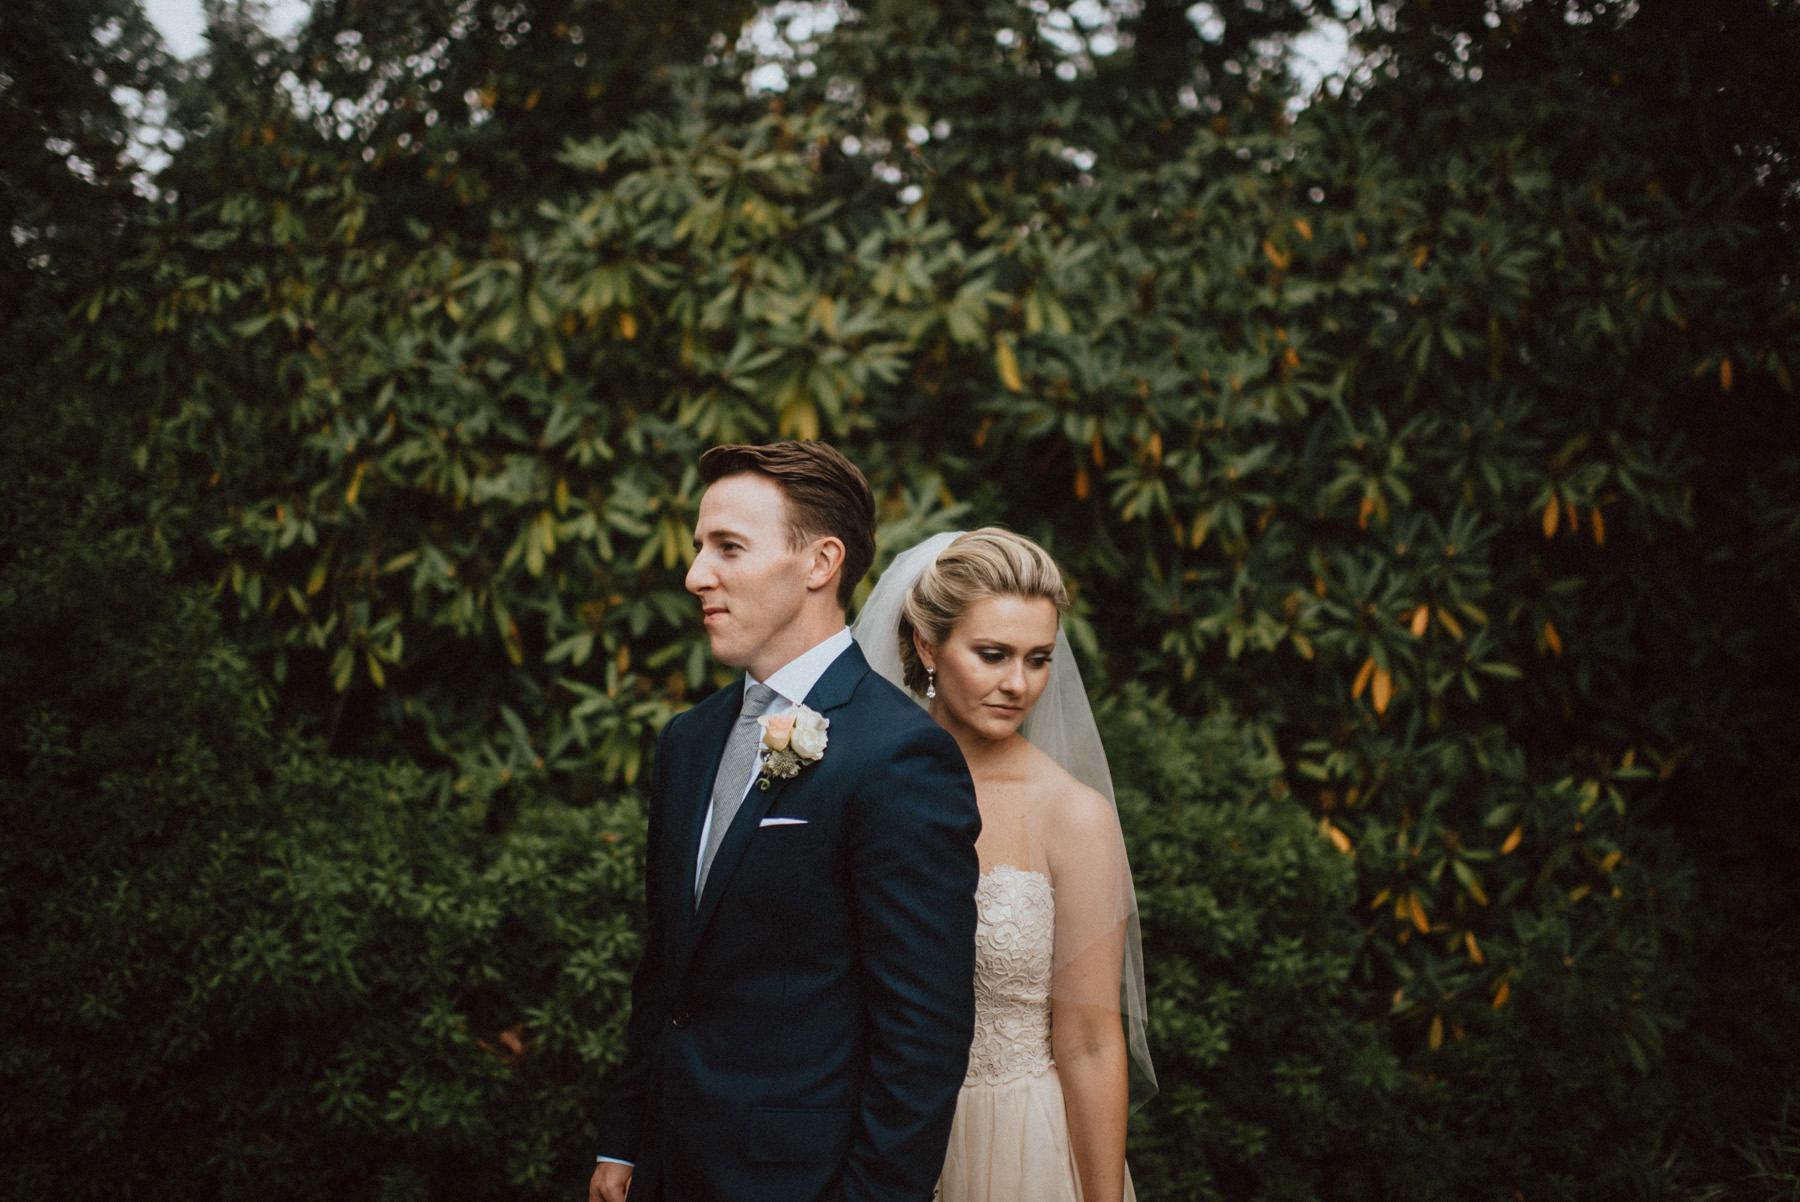 103-greenville-country-club-wedding-14.jpg